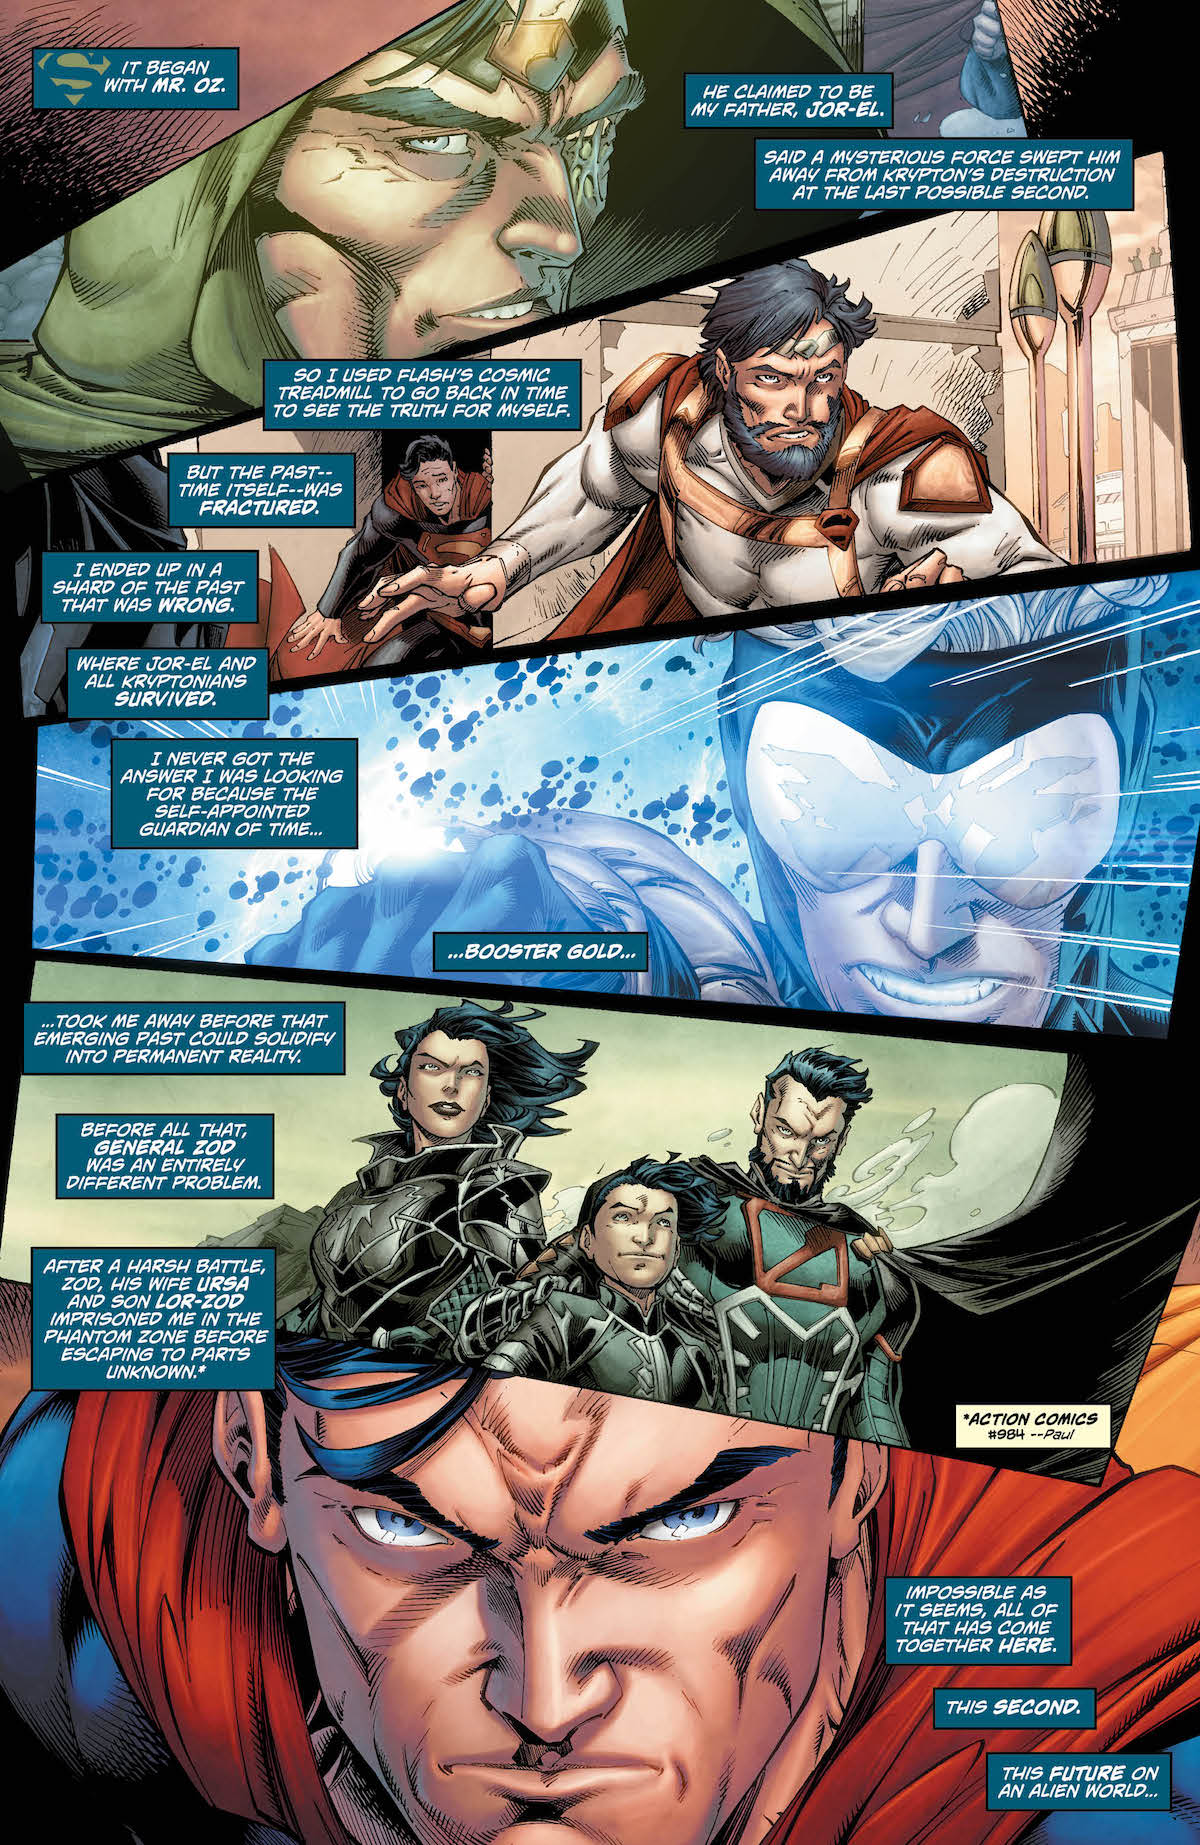 Superman: Action Comics #997 page 1